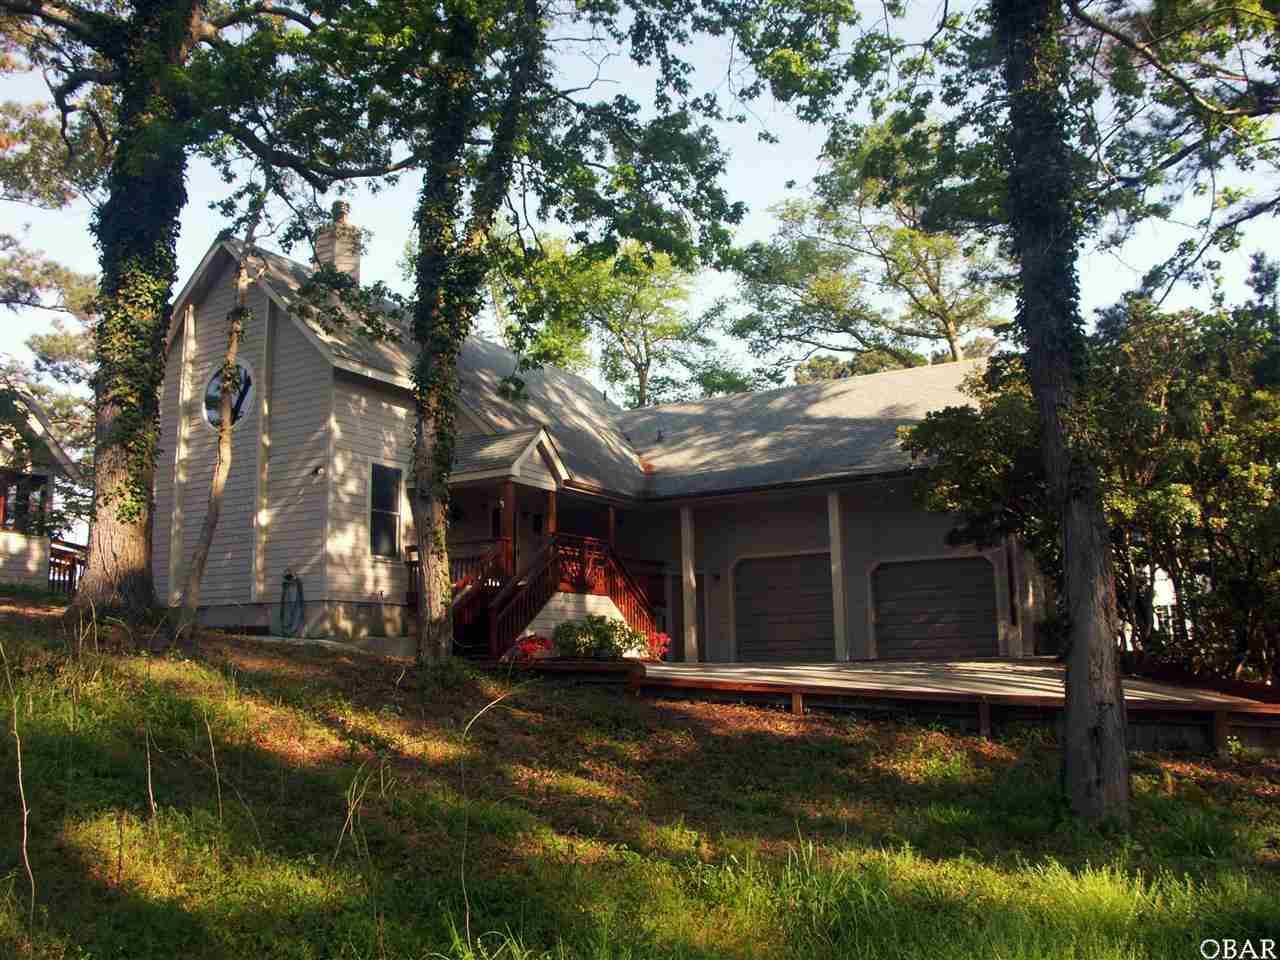 6072 Currituck Road,Kitty Hawk,NC 27949,3 Bedrooms Bedrooms,2 BathroomsBathrooms,Residential,Currituck Road,83577